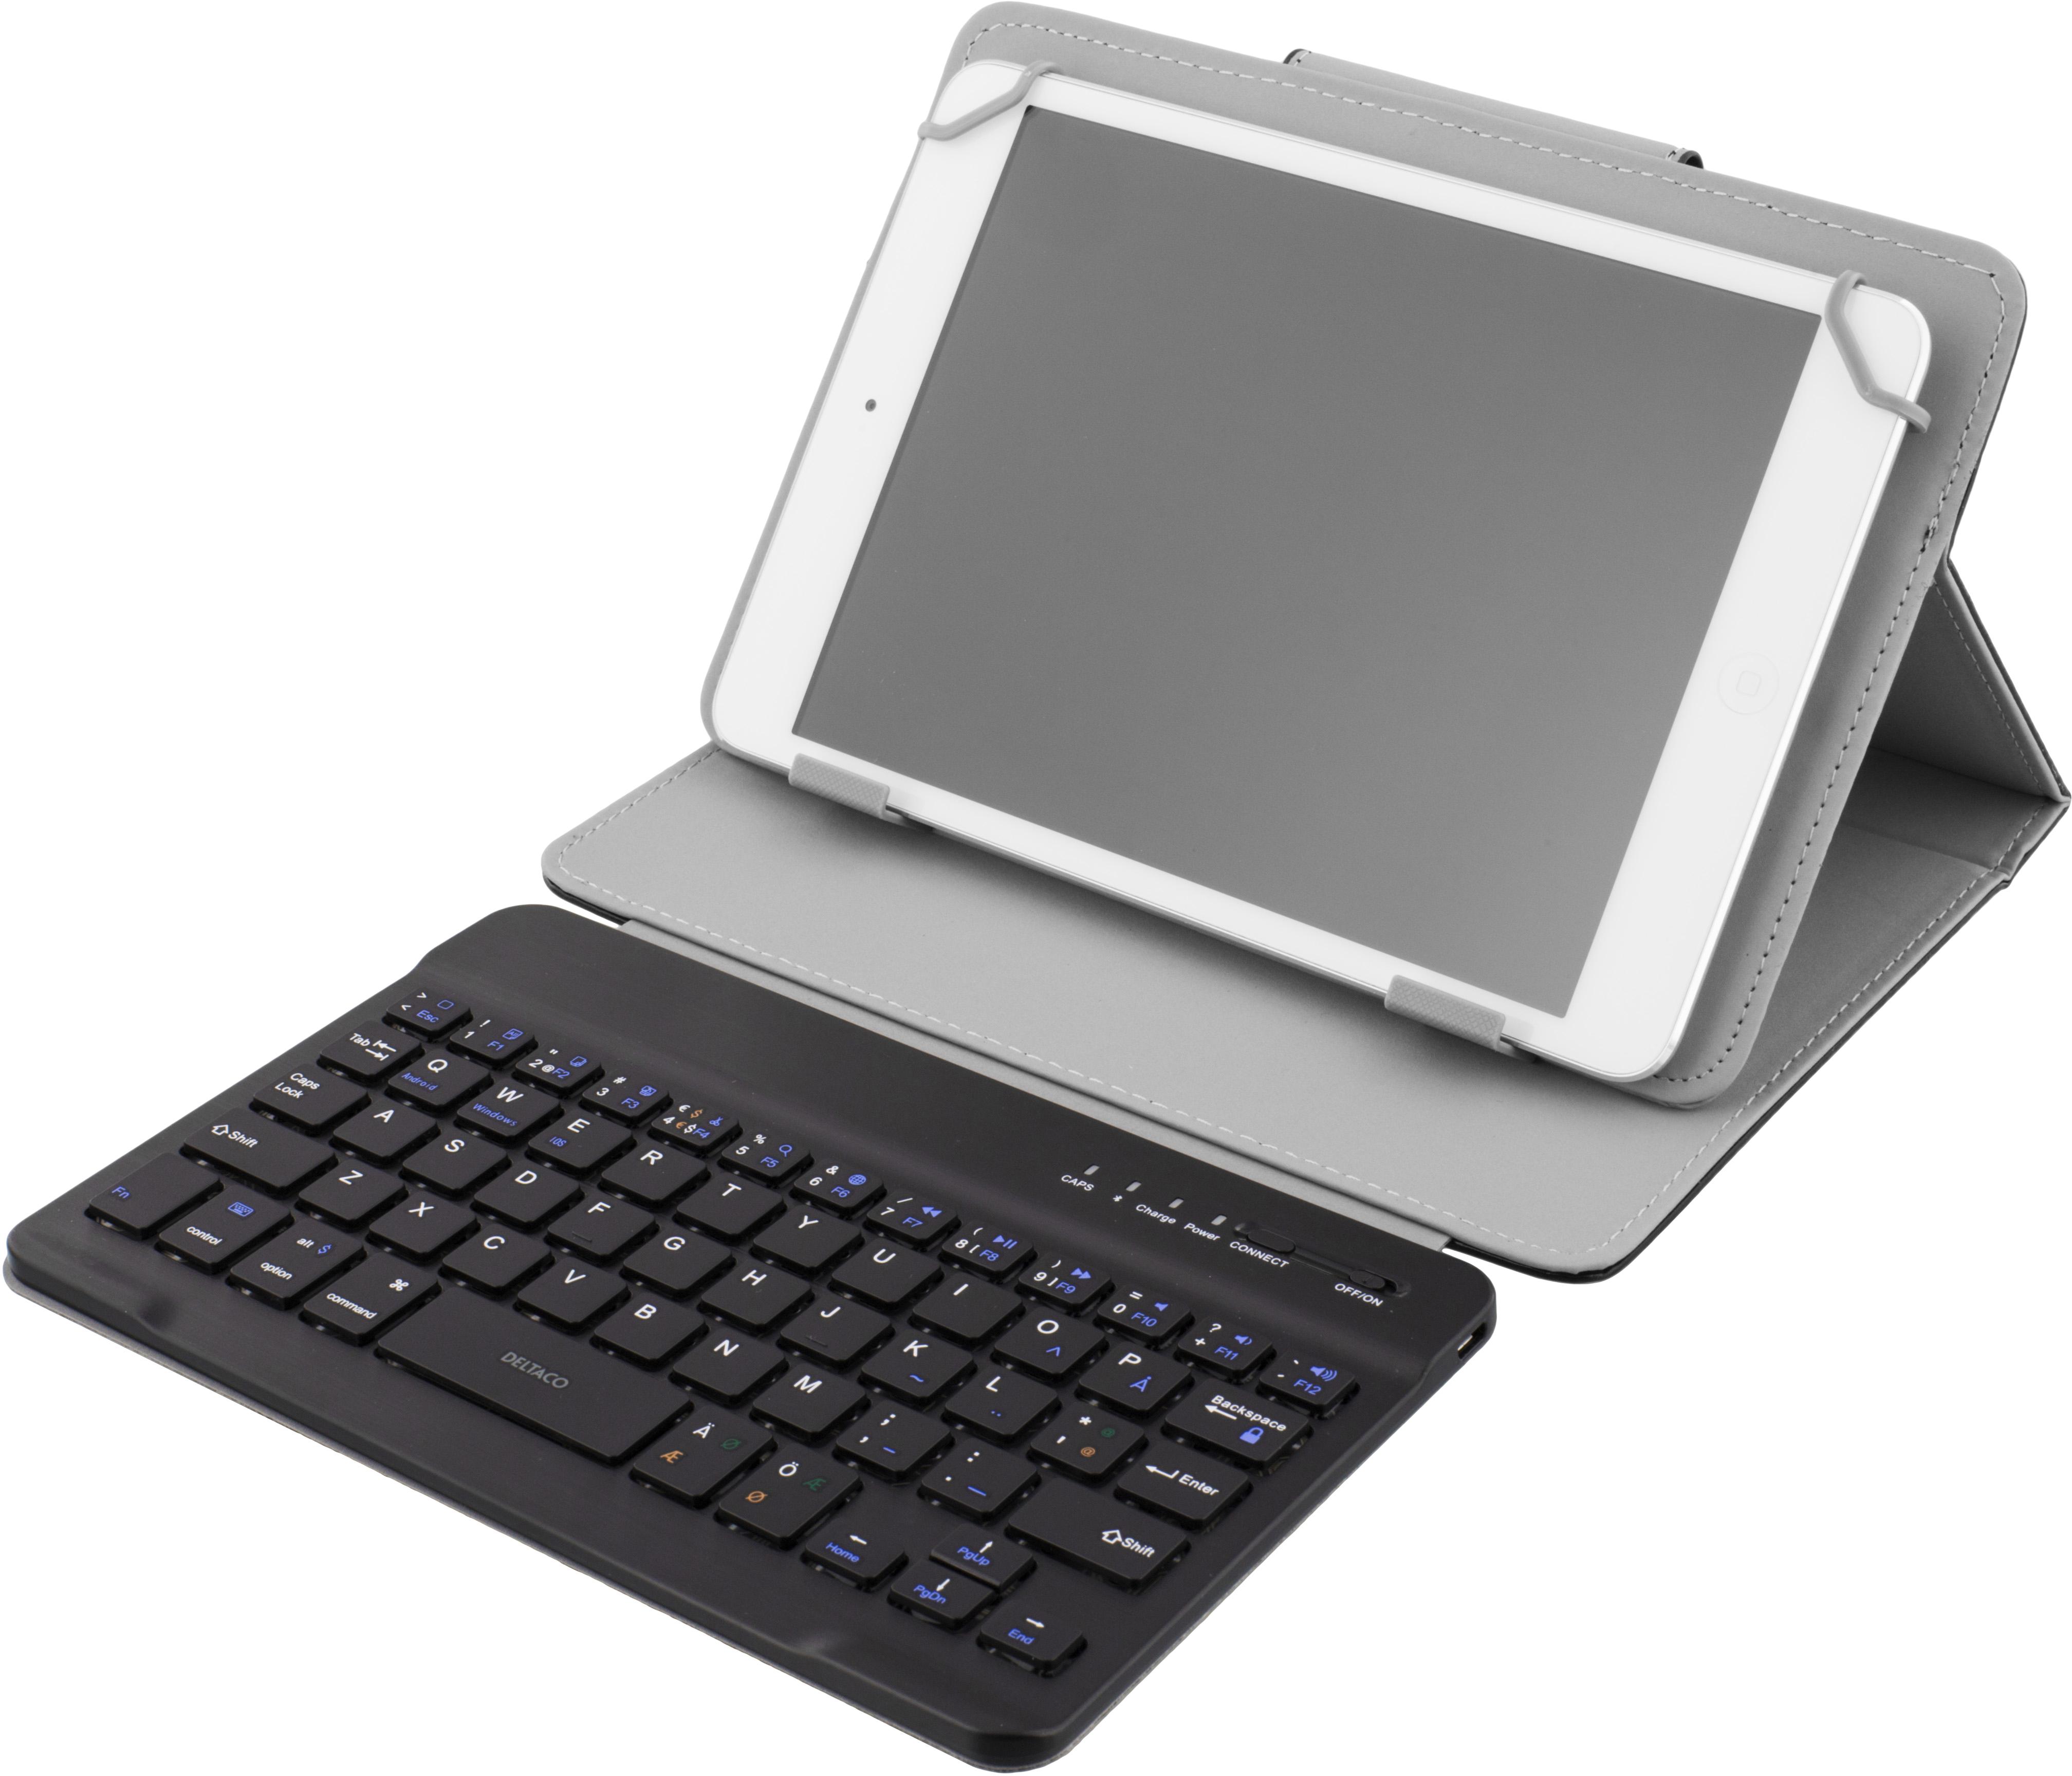 Deltaco deksel med tastatur for 7